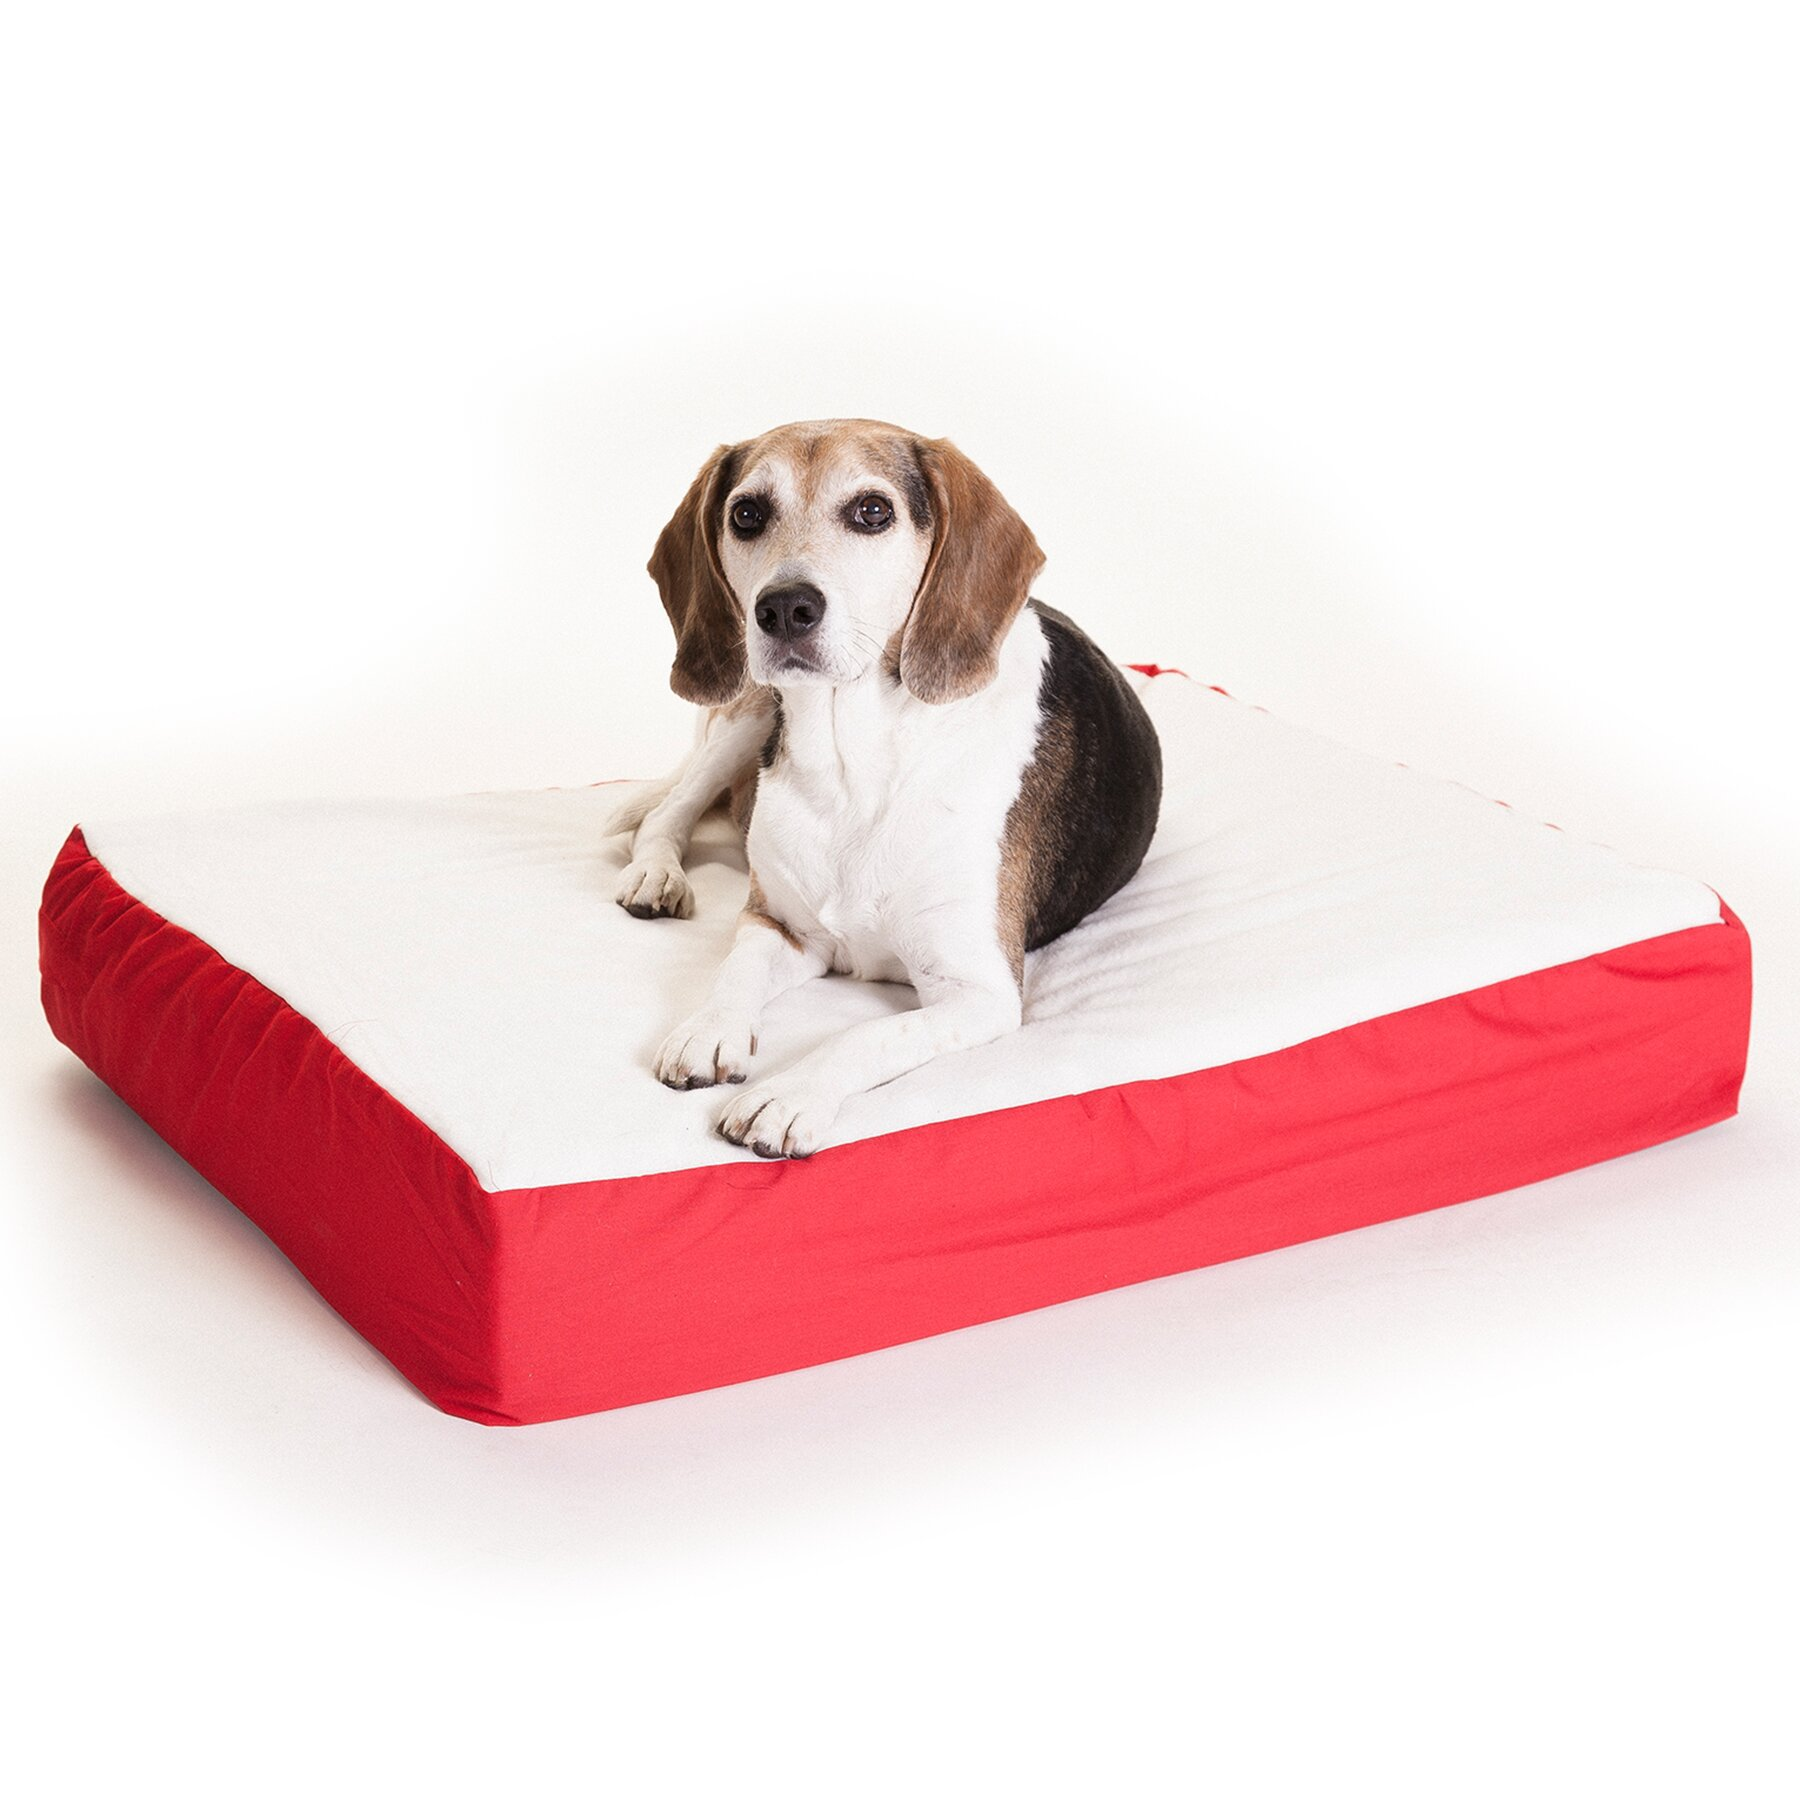 Majestic Pet Products Orthopedic Dog Bed